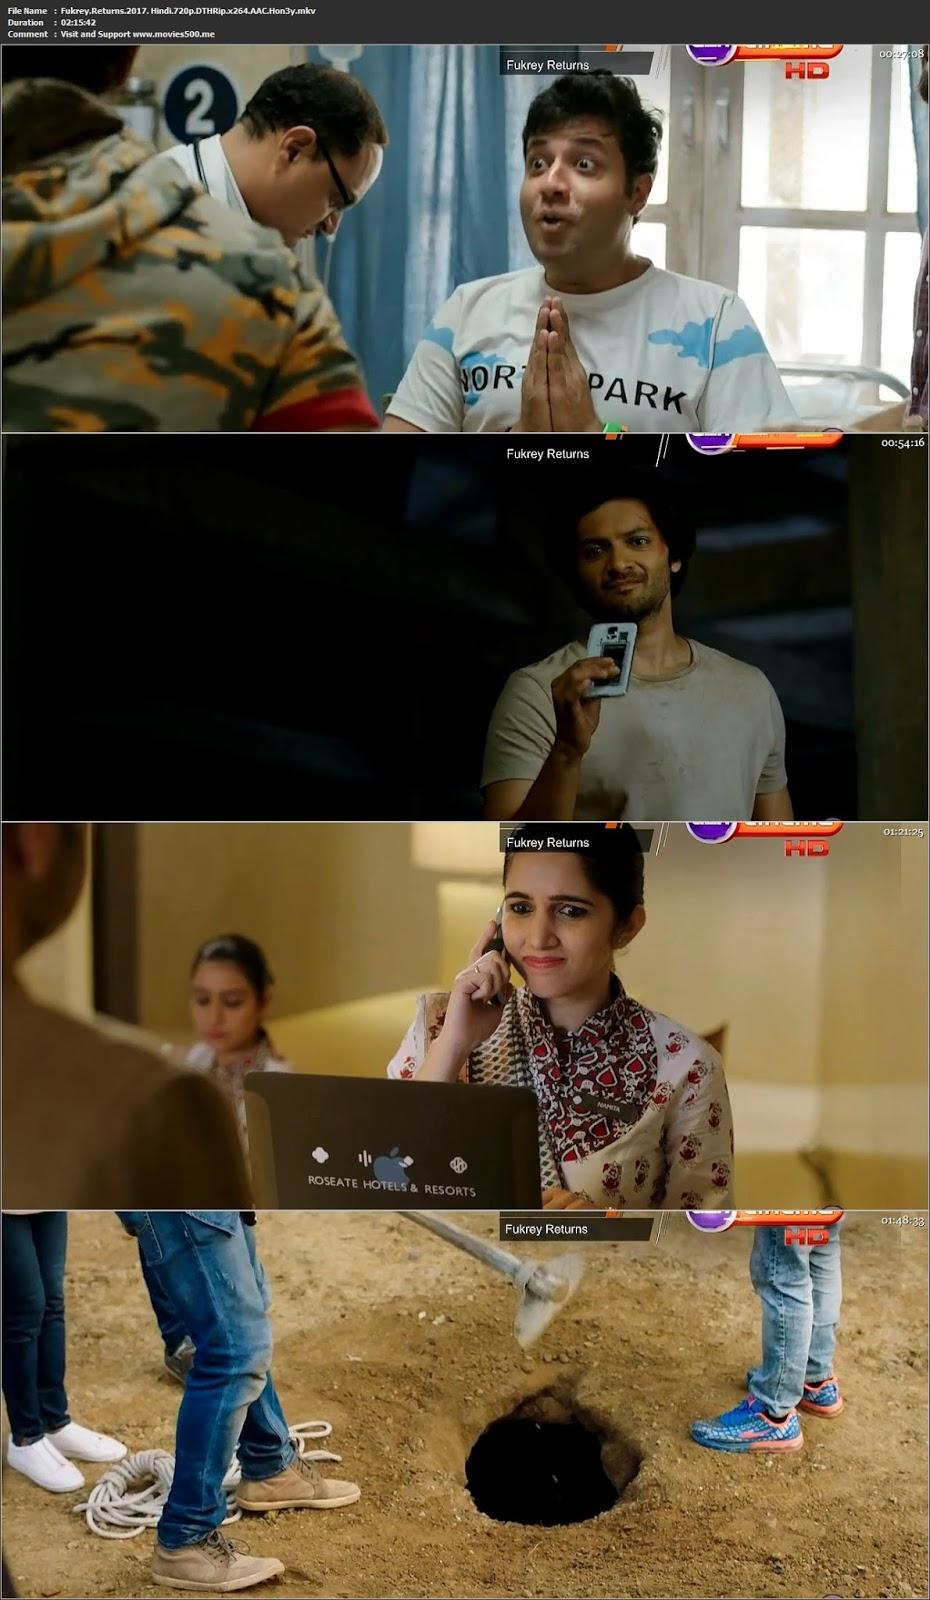 Fukrey Returns 2017 Hindi Full Movie DTHRip 720p 1GB at 9966132.com